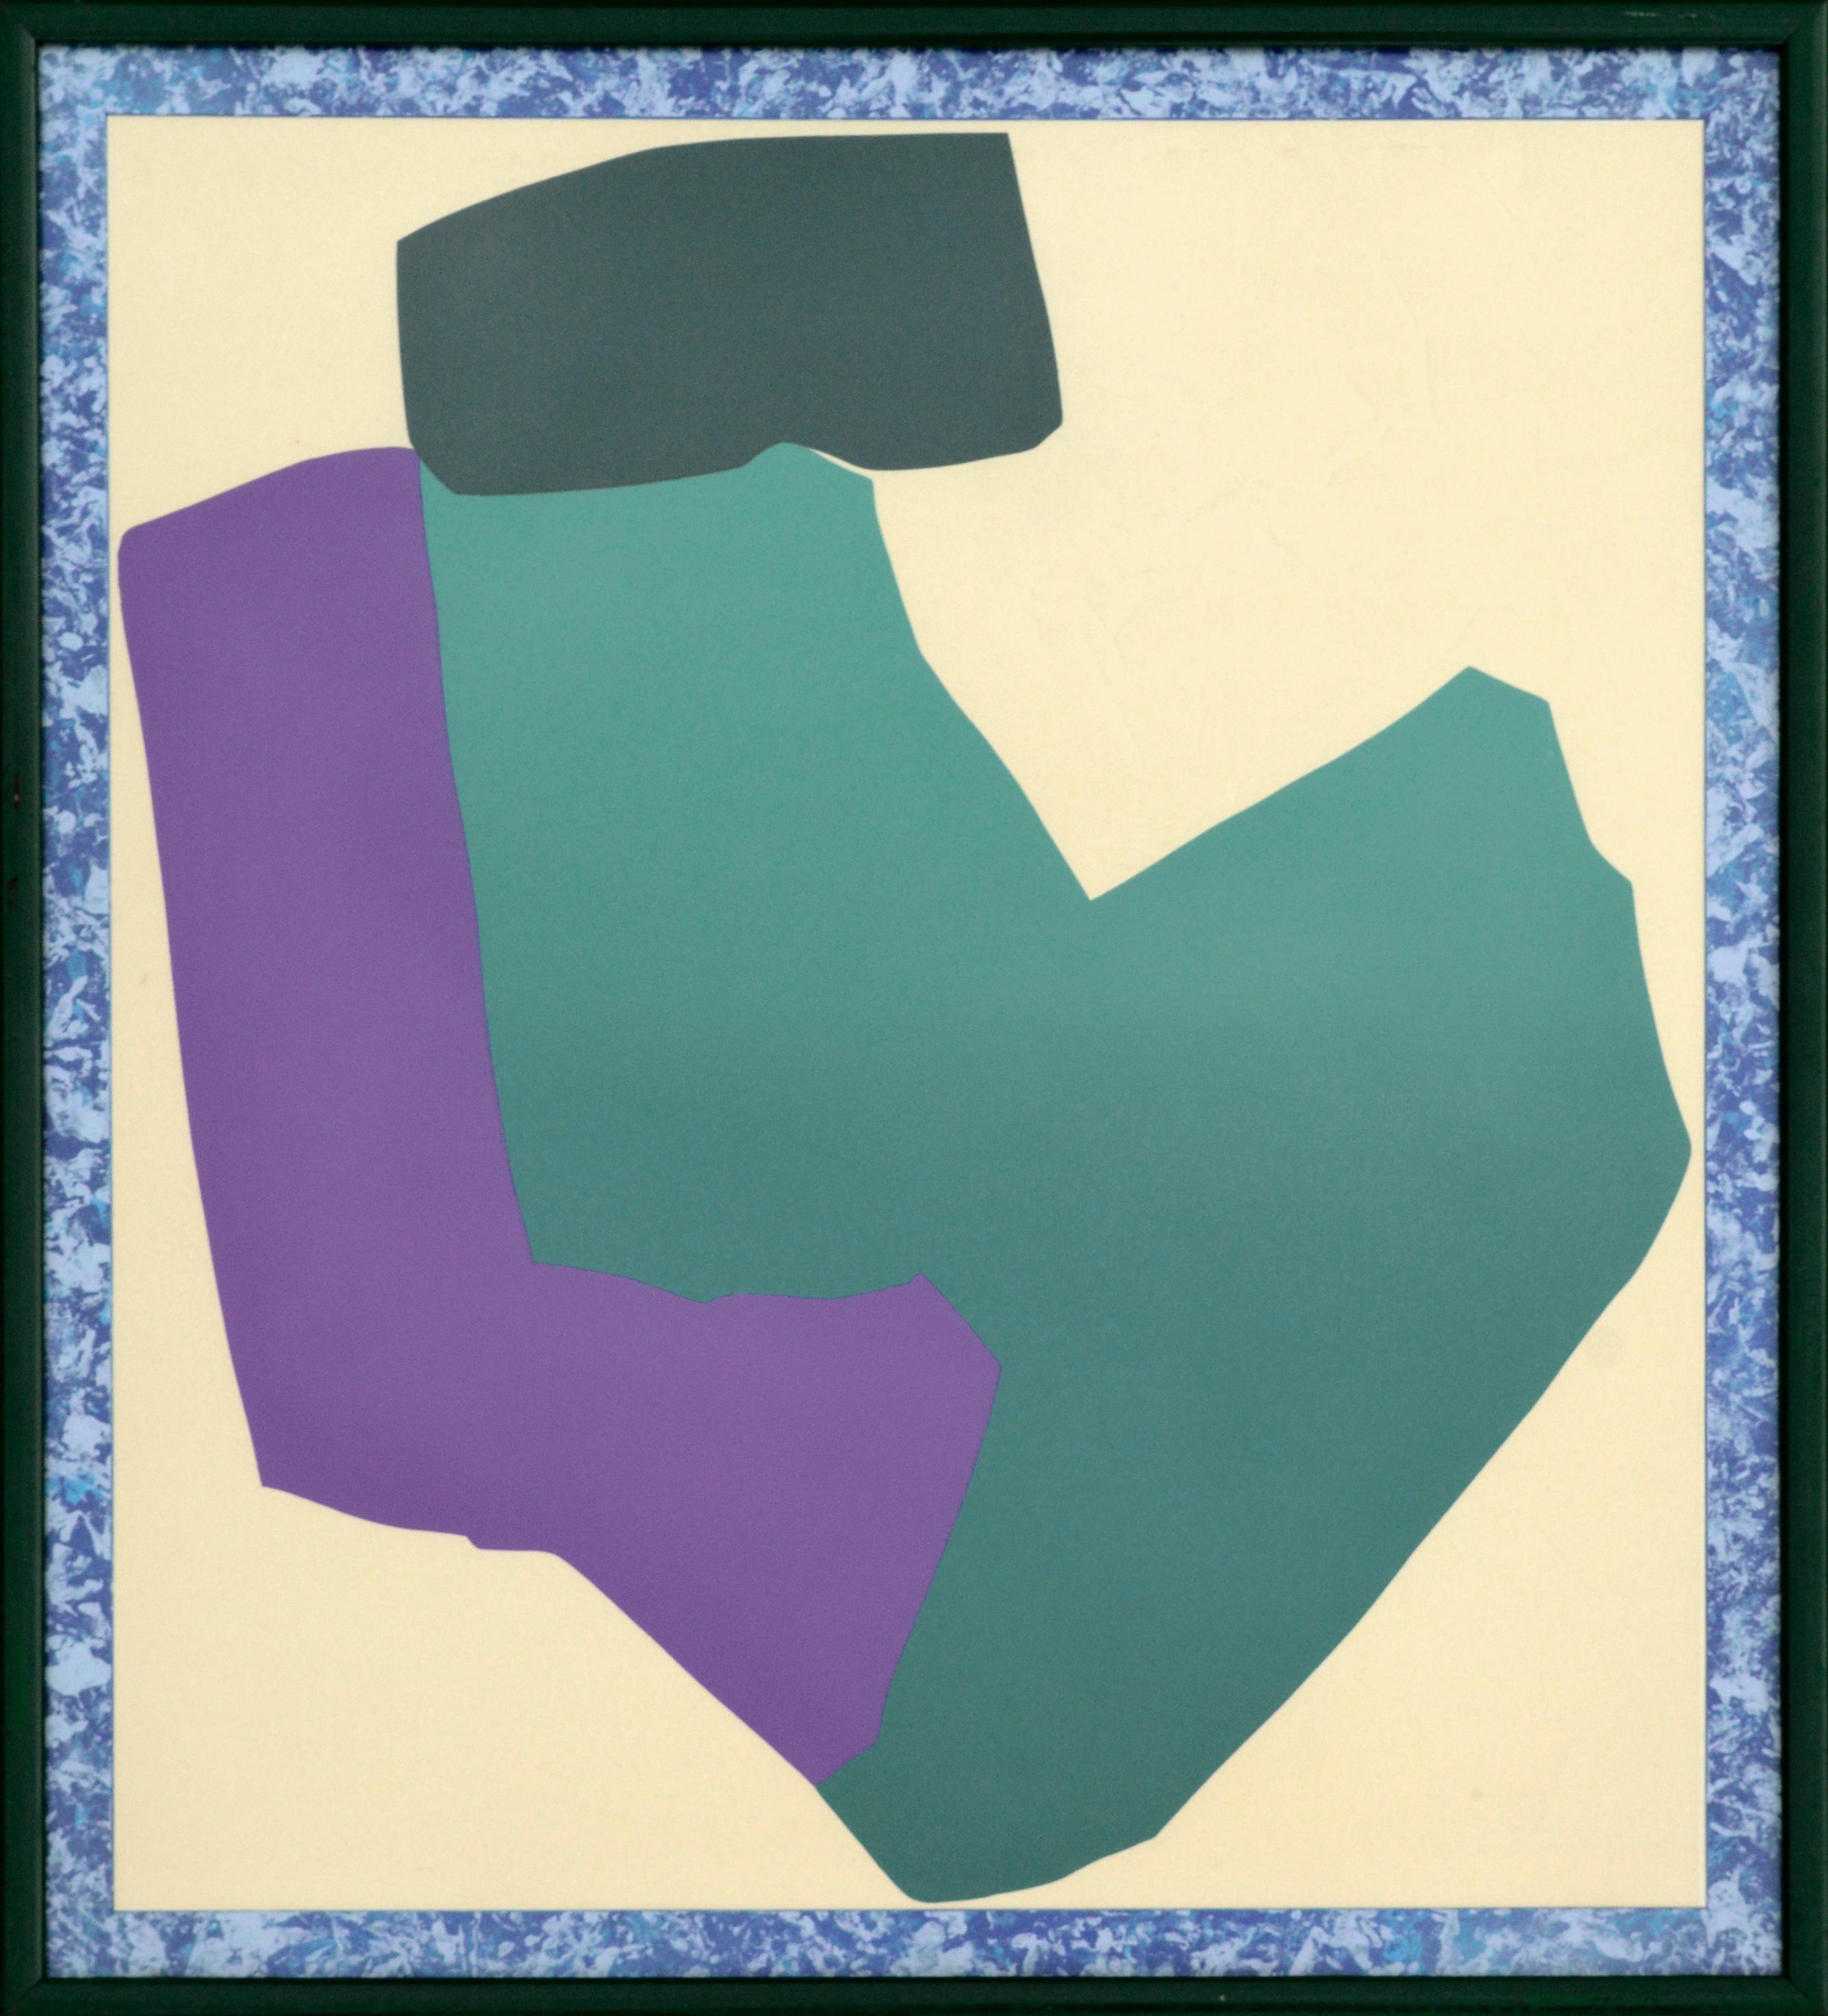 Teal and Purple Abstract Geometric Multi-Layer Screenprint